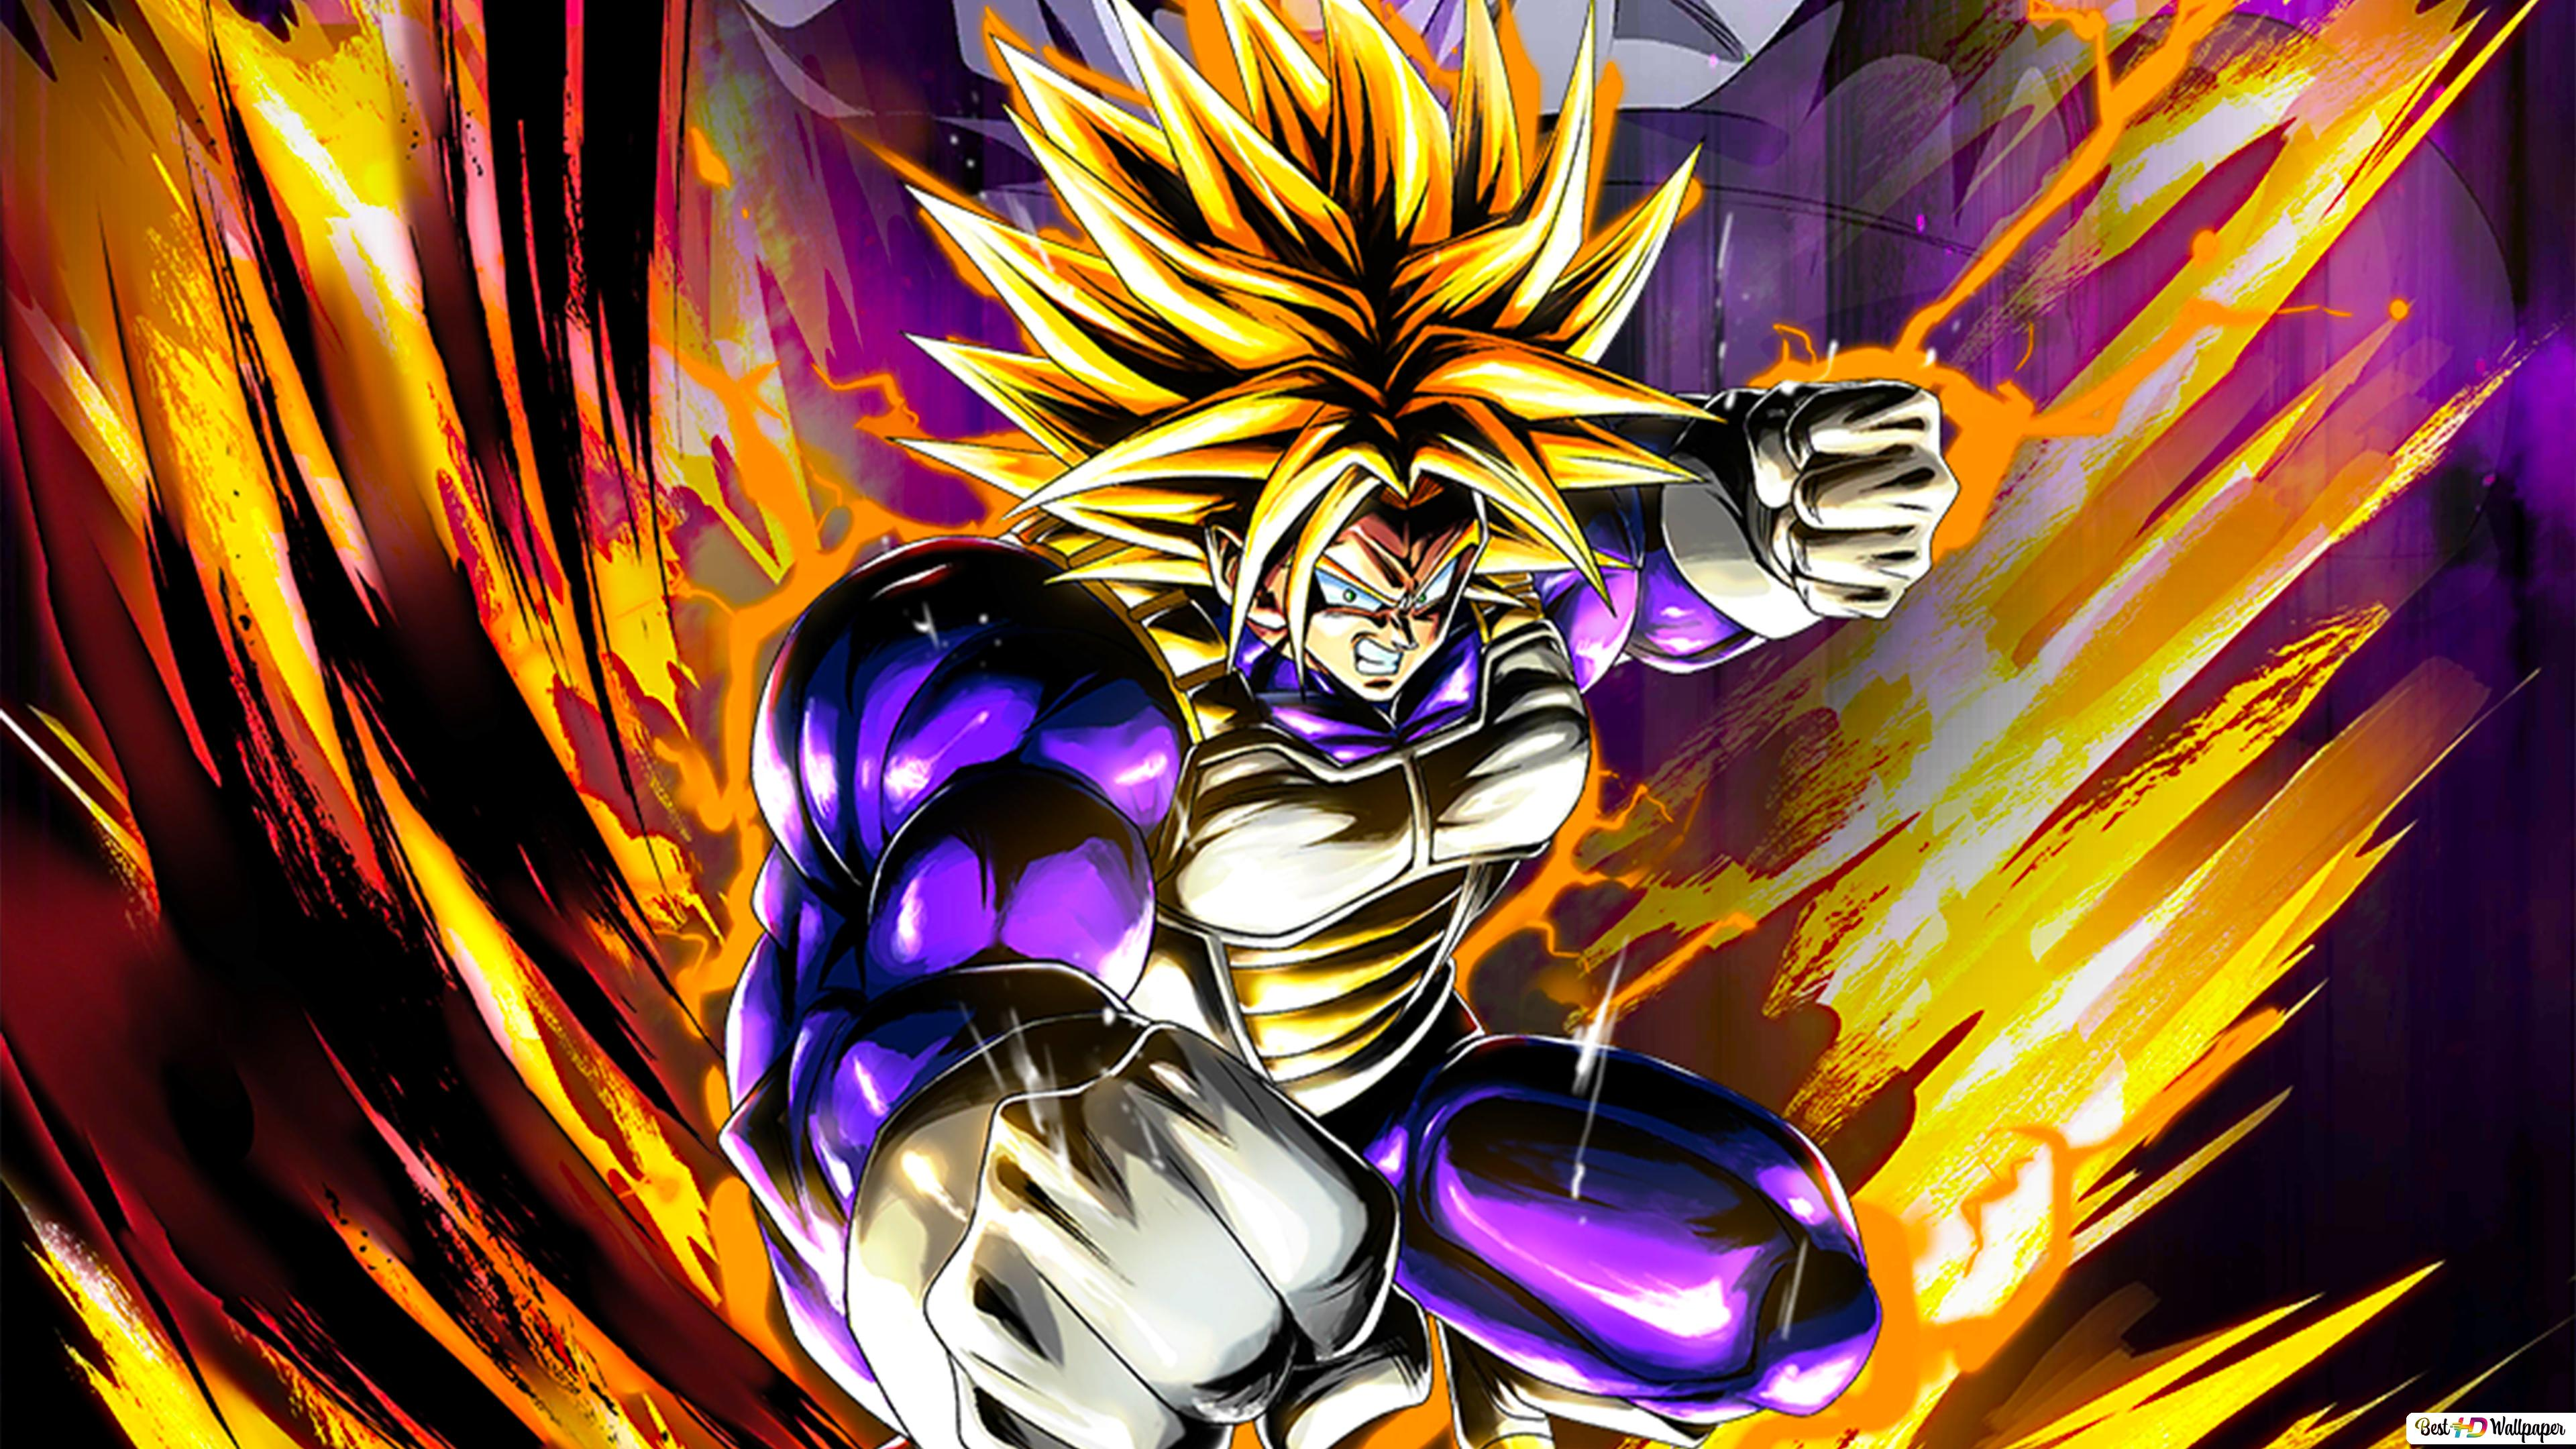 Super Trunks Dari Dragon Ball Z Dragon Ball Legends Arts Untuk Desktop Unduhan Wallpaper Hd